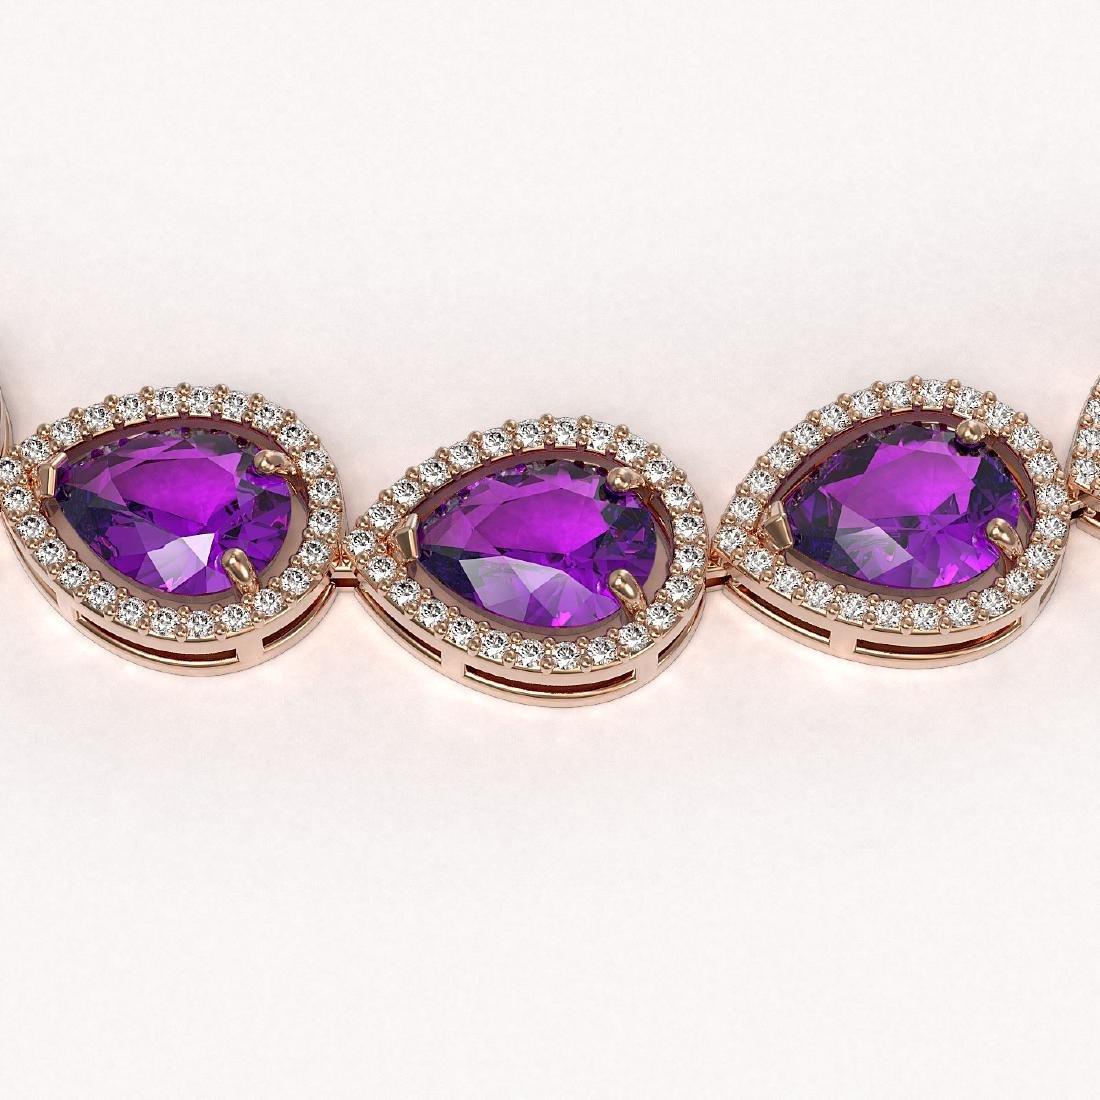 43.2 CTW Amethyst & Diamond Halo Necklace 10K Rose Gold - 3